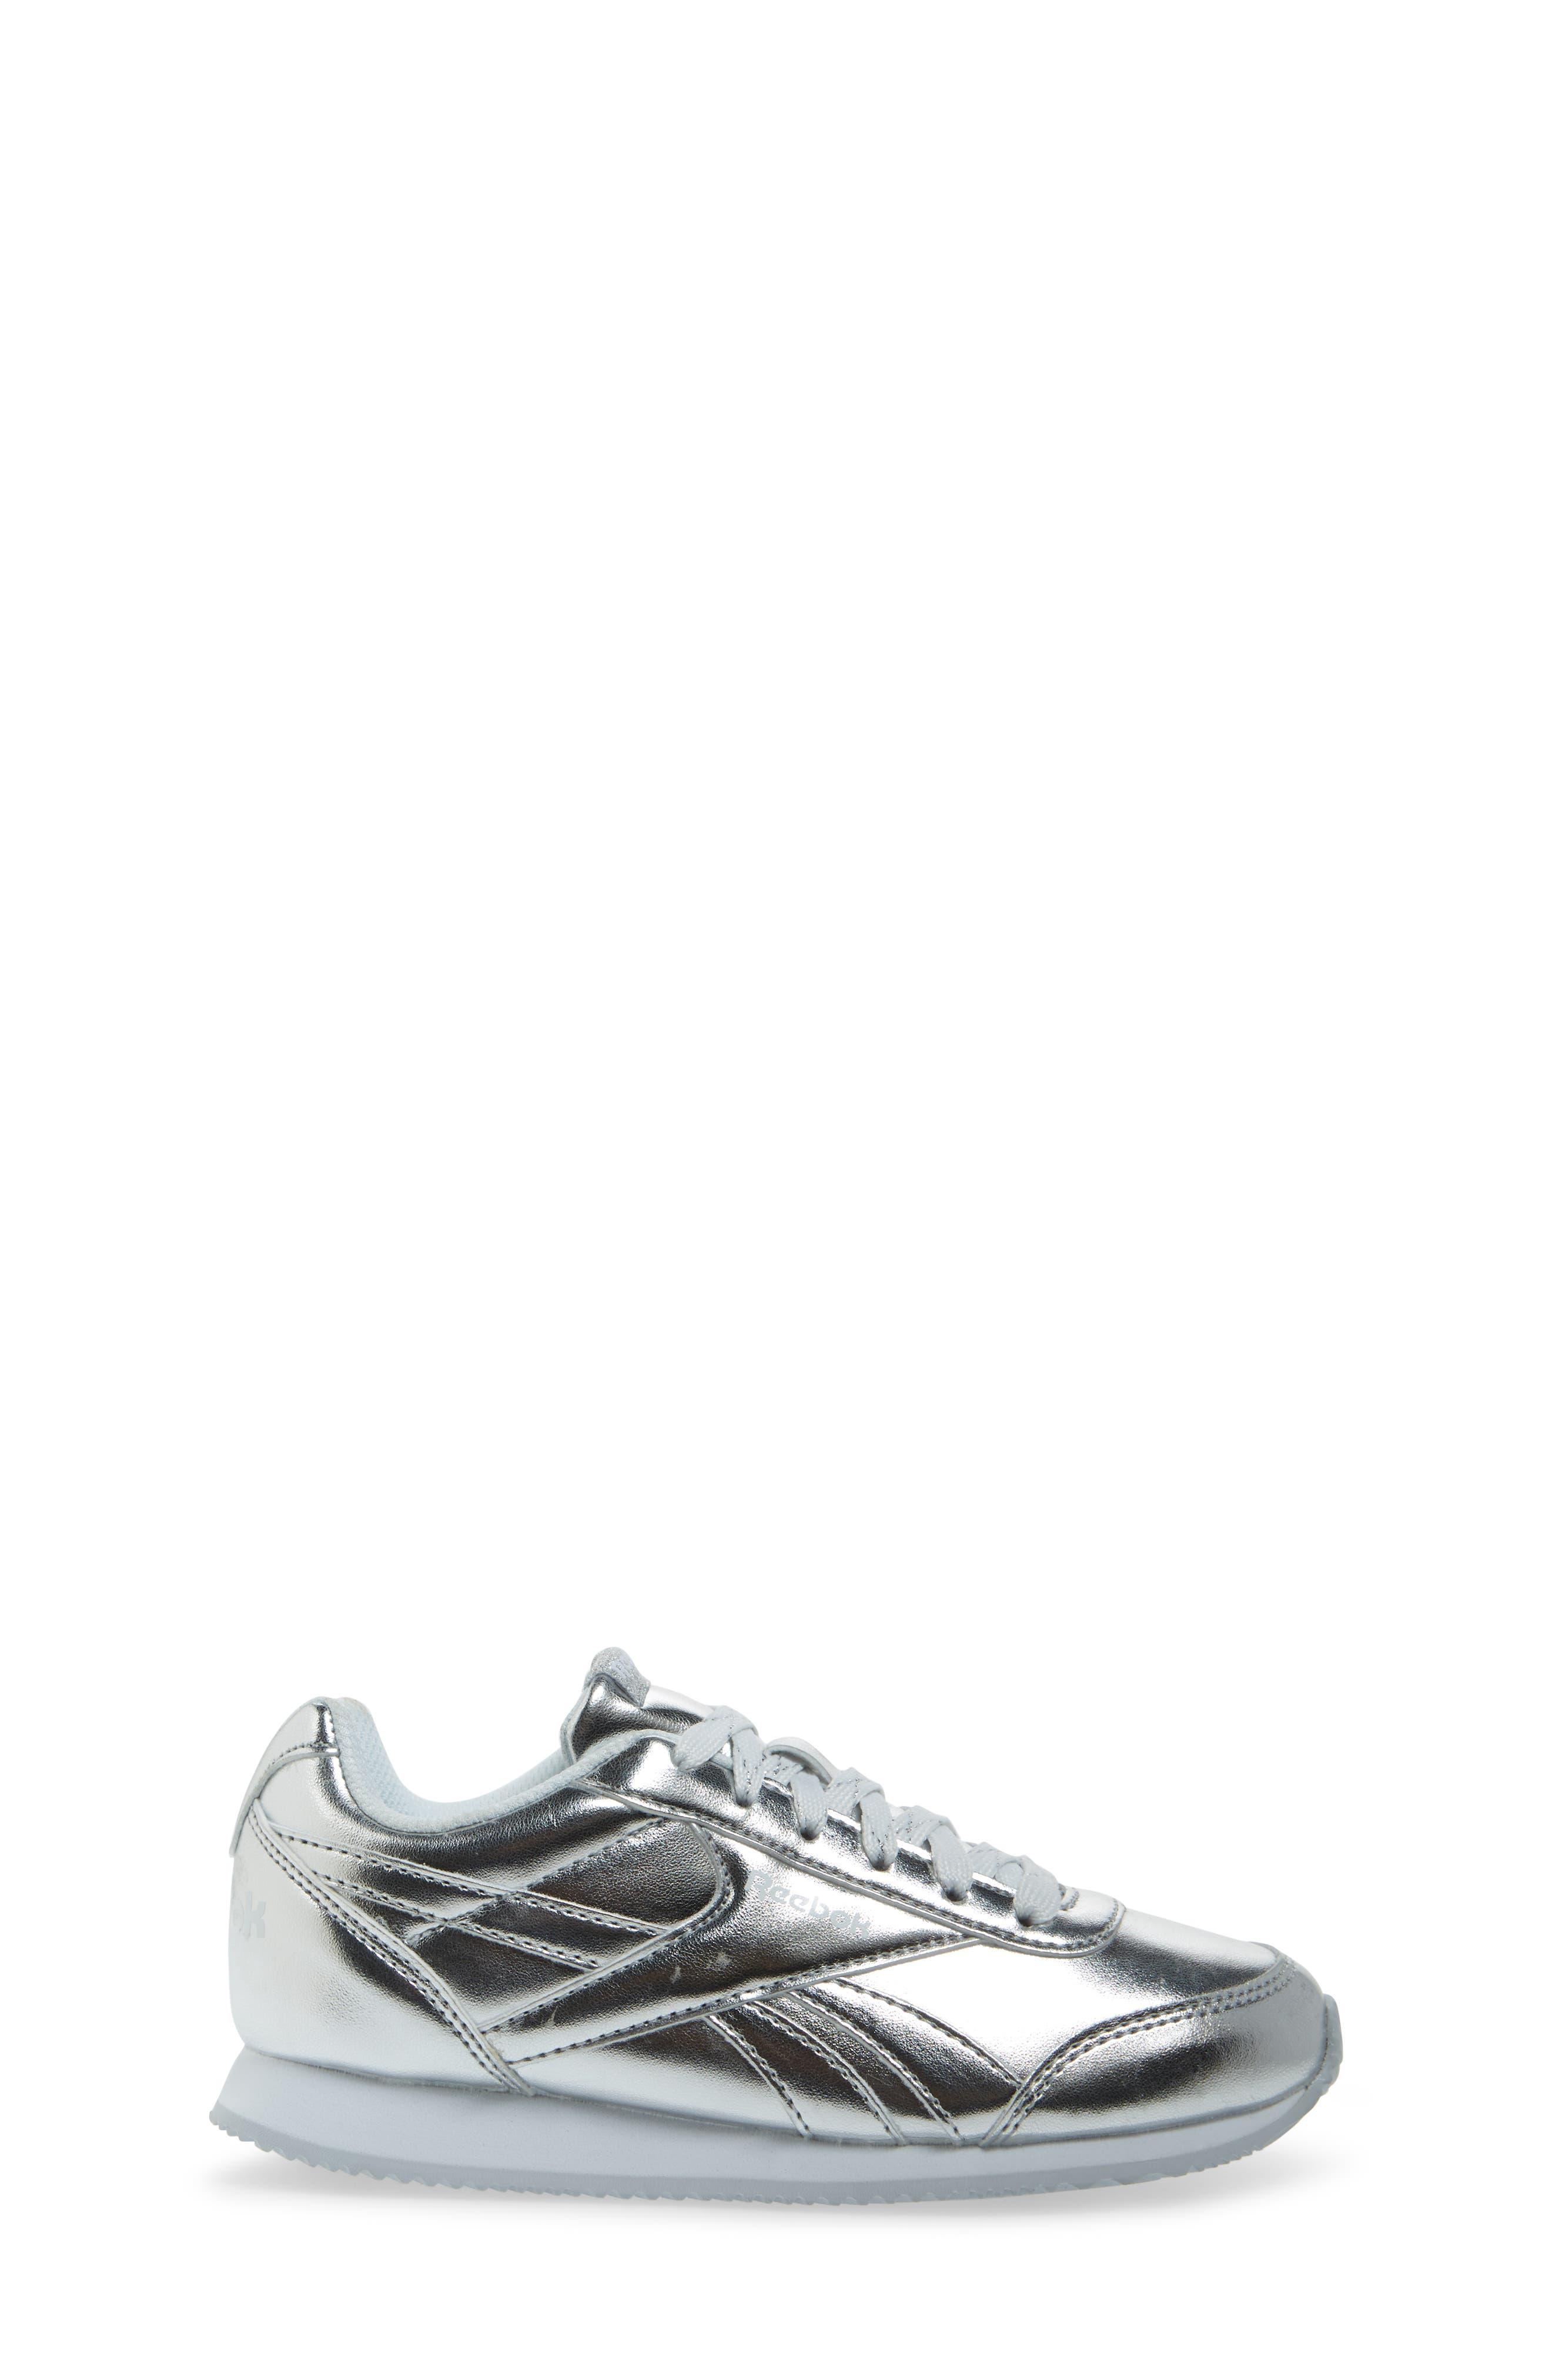 Royal Classic Jogger 2.0 Sneaker,                             Alternate thumbnail 3, color,                             040